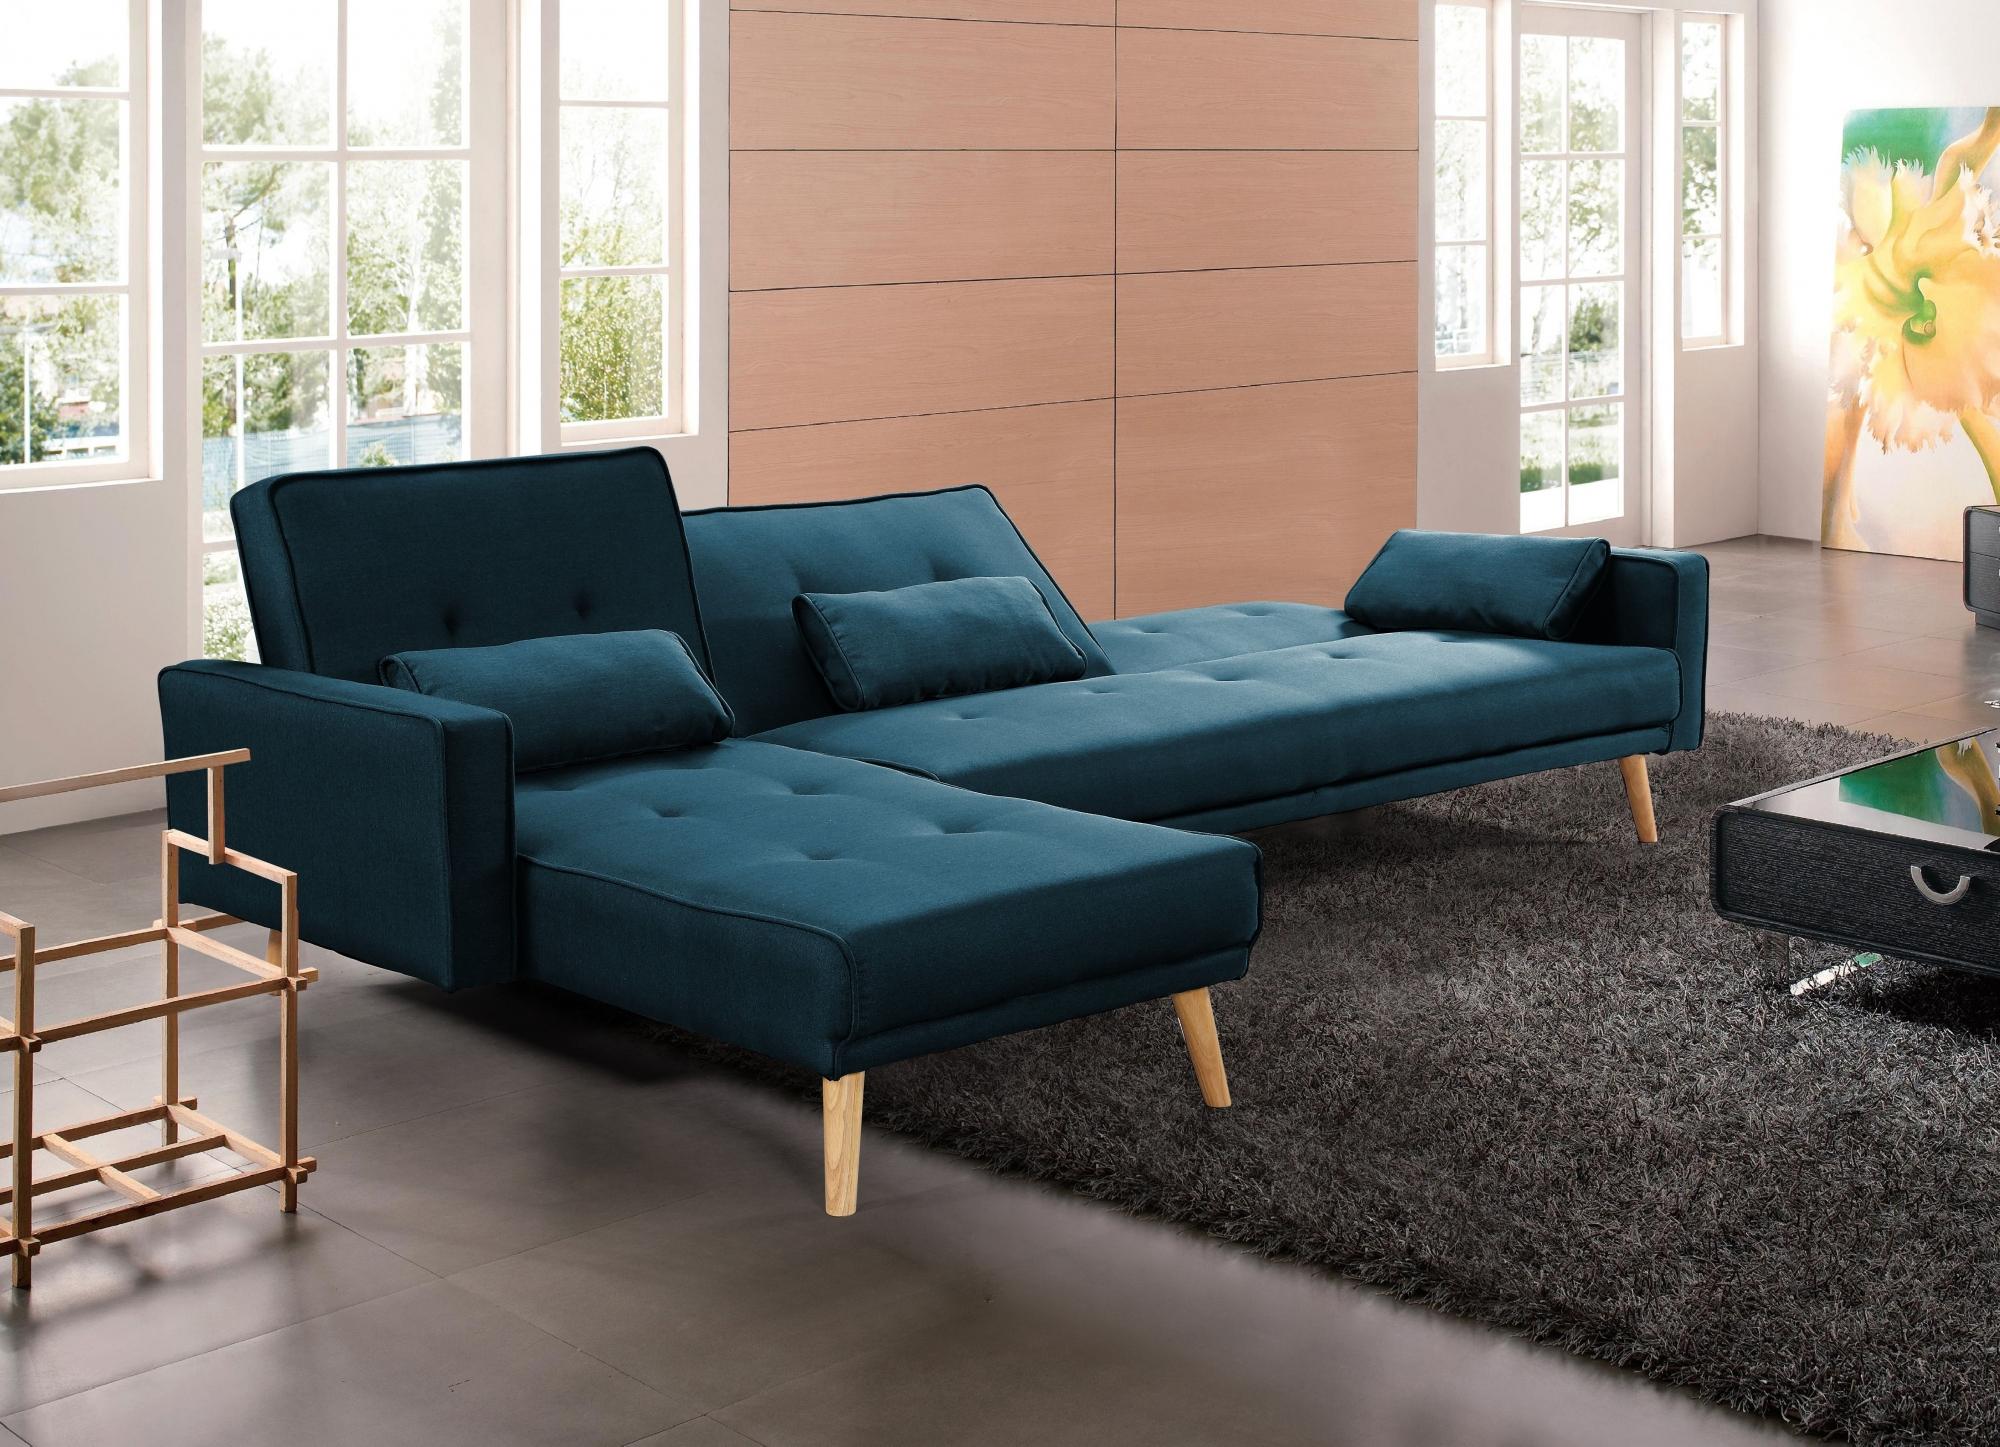 Canapé Tissu Bleu Conception